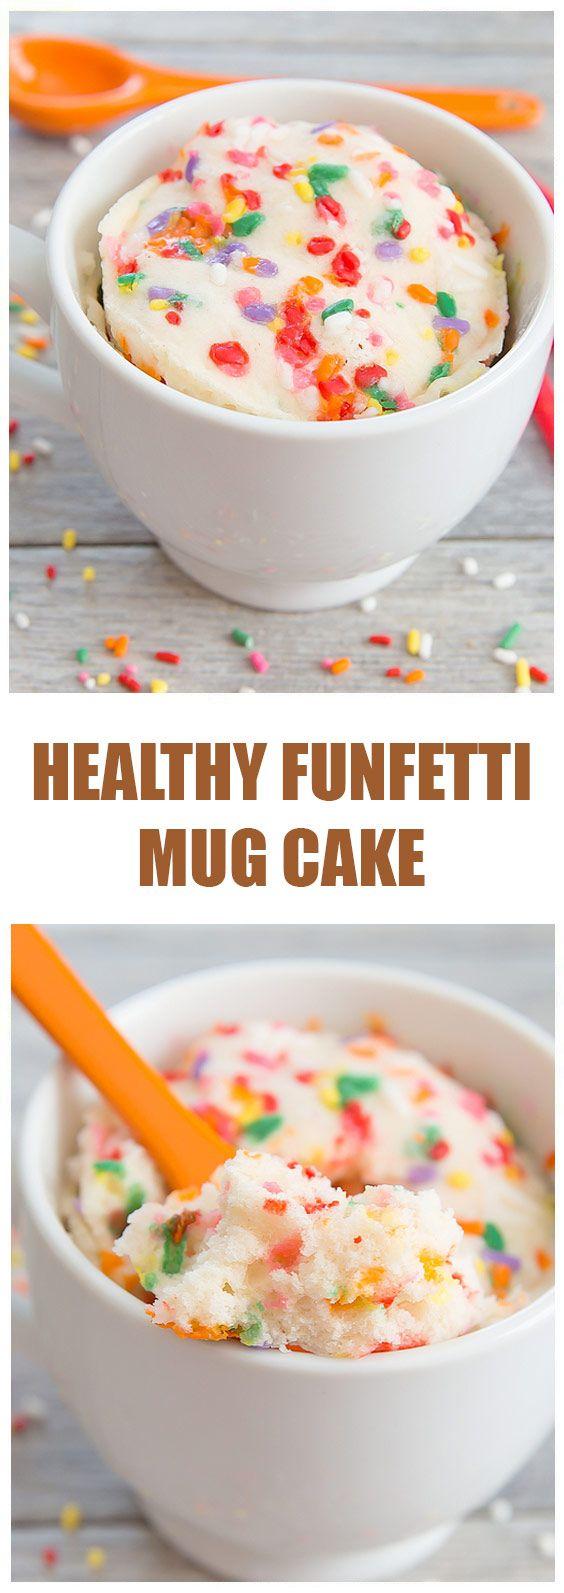 Healthy Funfetti Mug Cake - Cook pad USA | Healthy ...